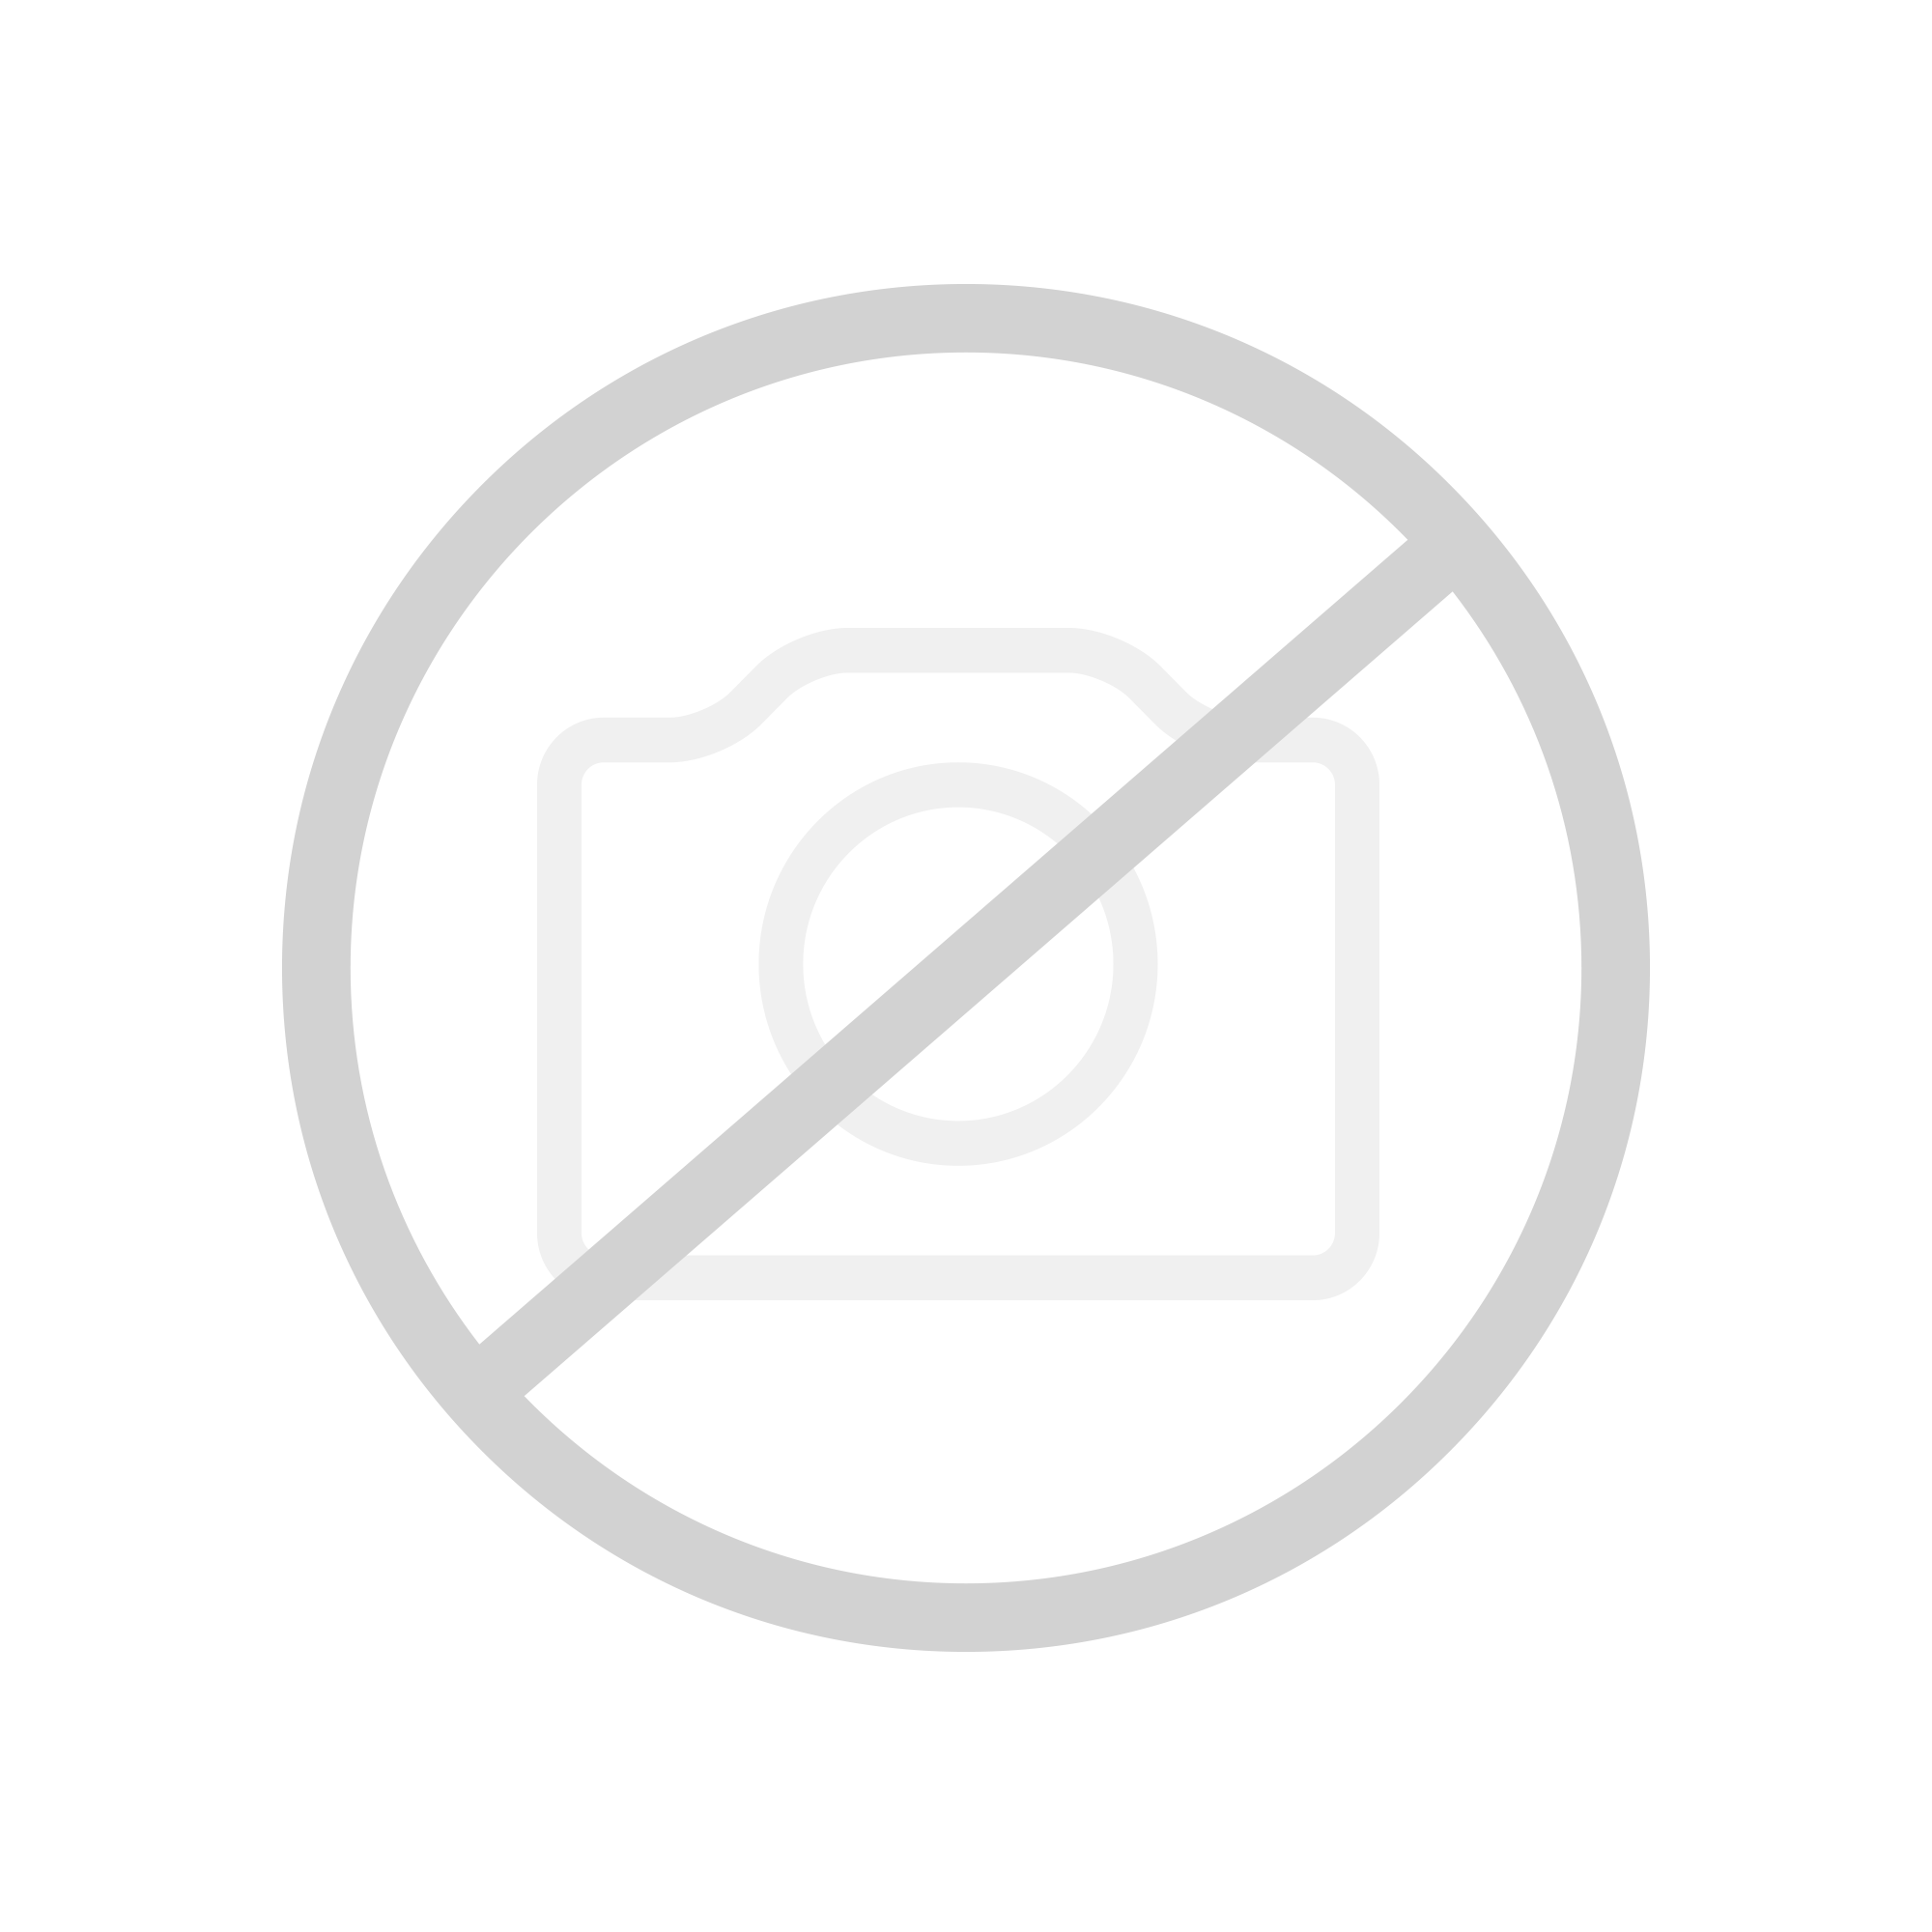 Kaldewei Nobler Purismus Ambiente Kollektion Badewannengriff Typ A